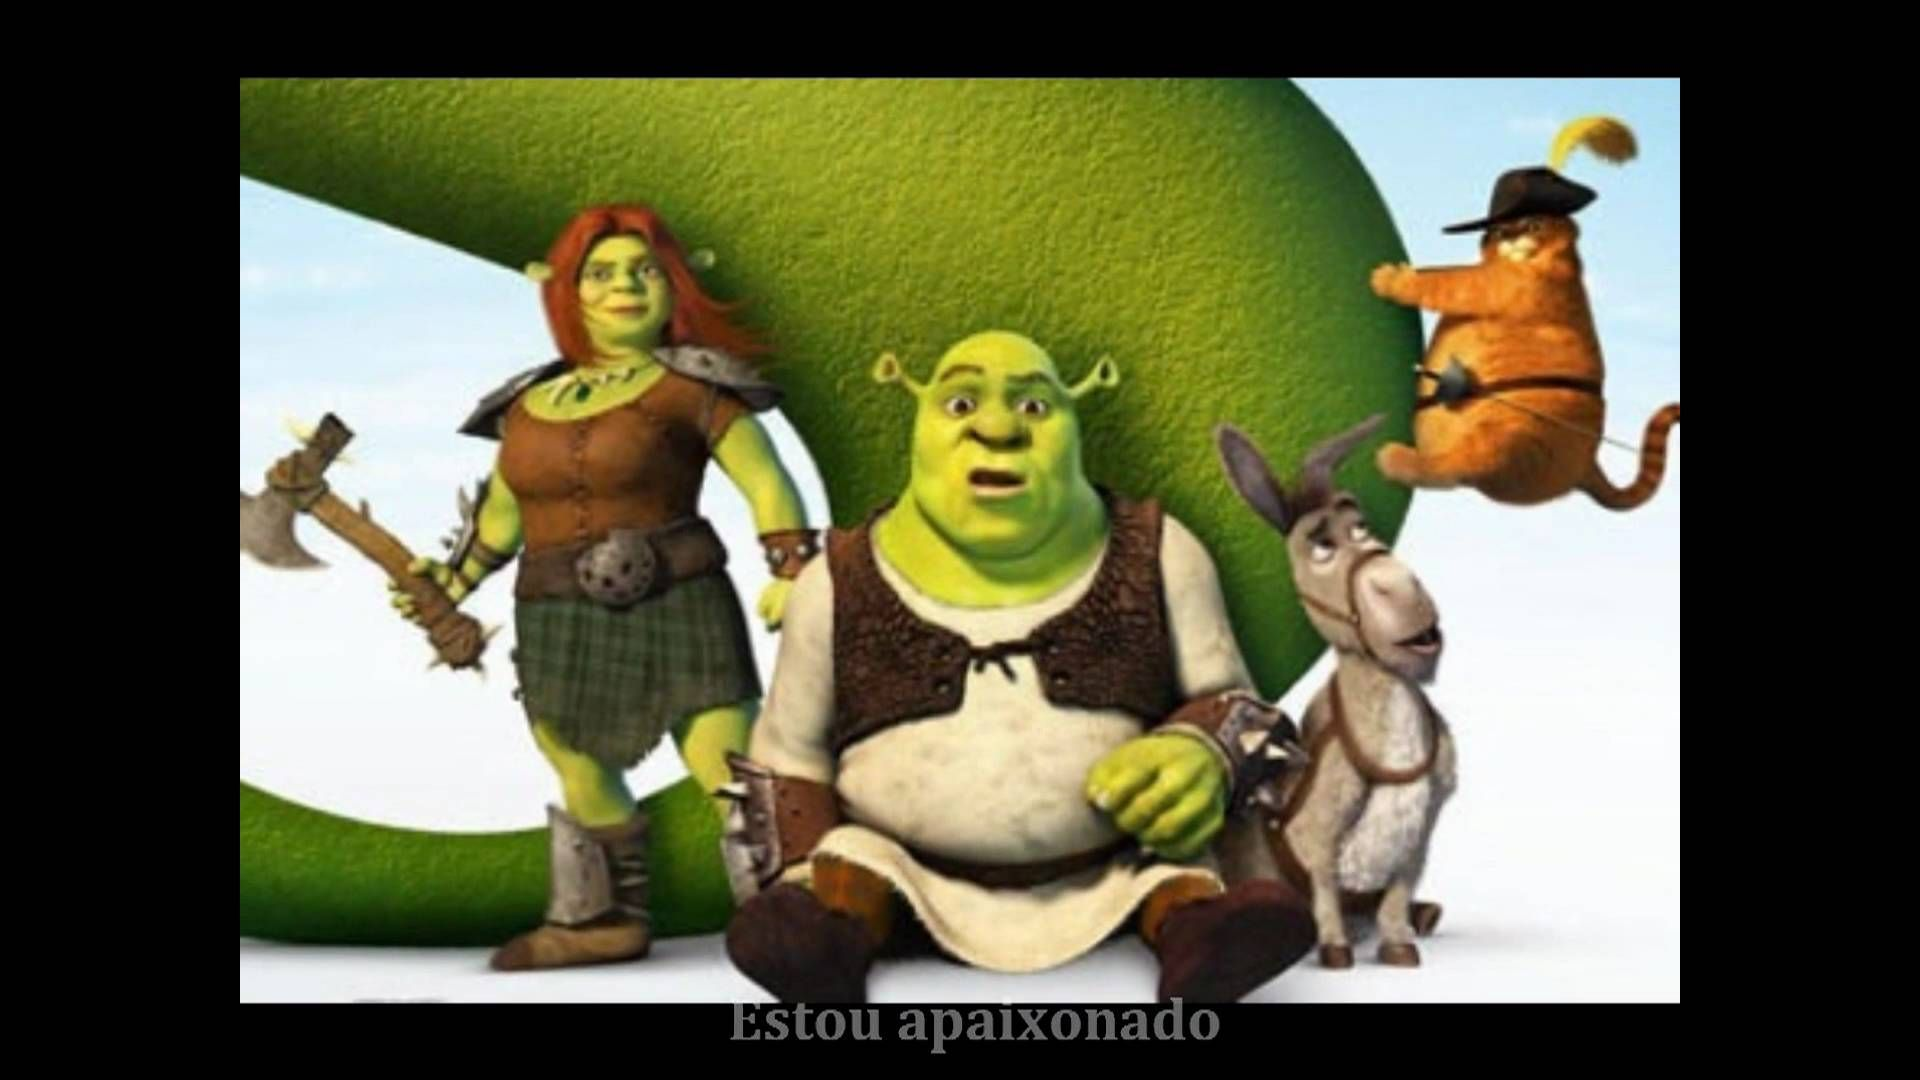 Pin by Paulo Henrique on Shrek | Shrek, Cartoon wallpaper hd, Cartoon crazy